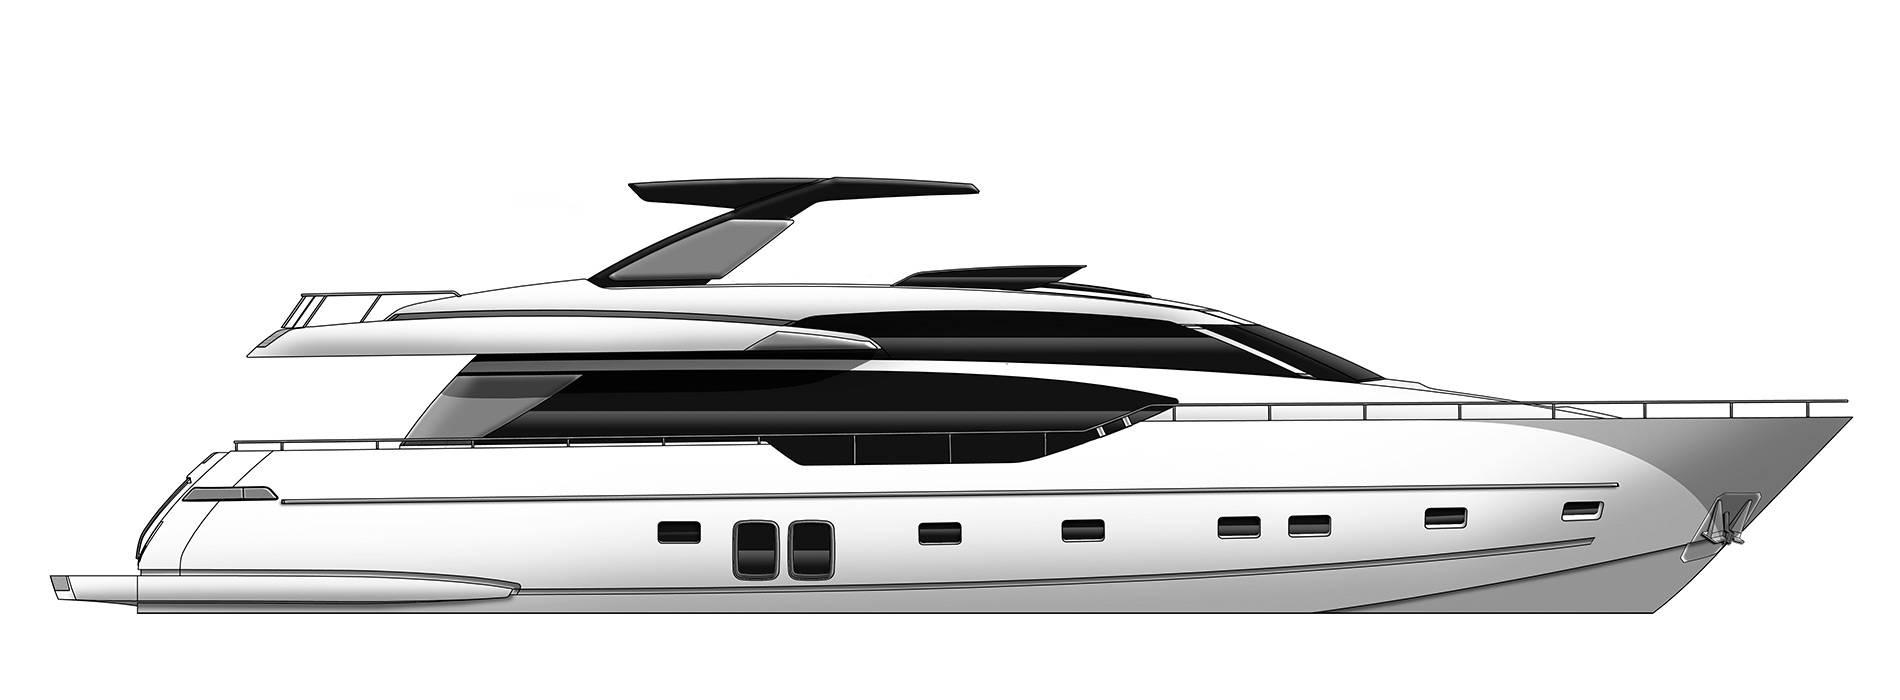 Sanlorenzo Yachts SL86 Profile